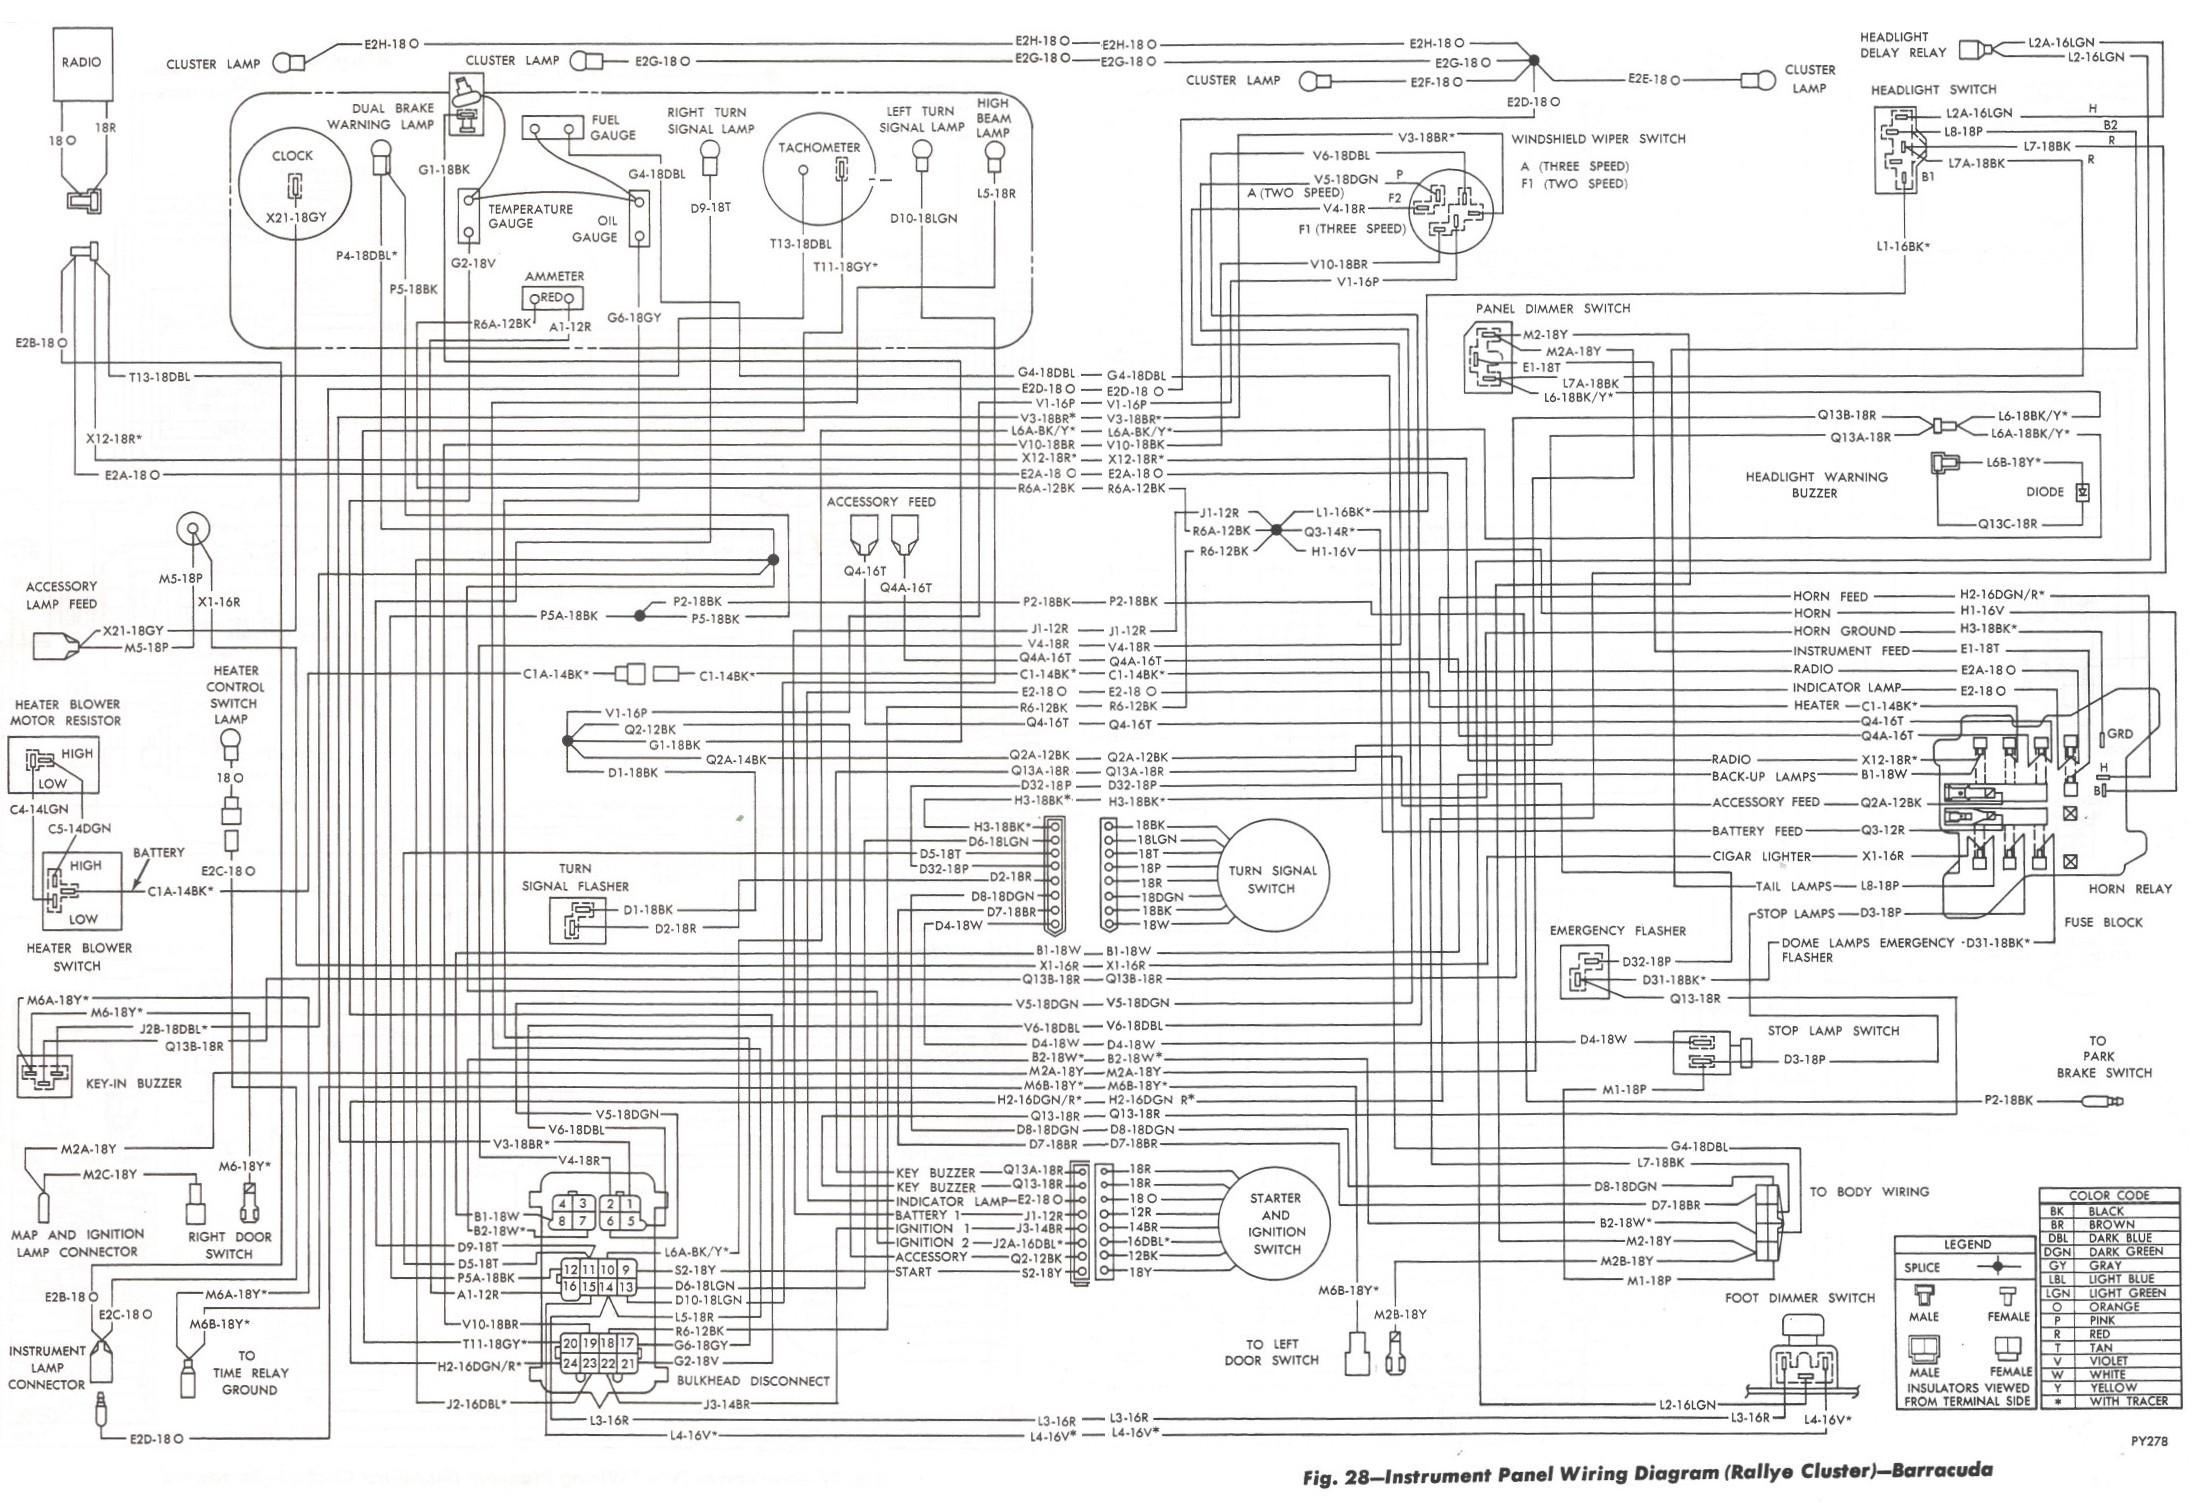 1970 cuda wiring harness wiring diagram dash 1967 dodge dart wiring-diagram 1970 plymouth wiring diagram #10